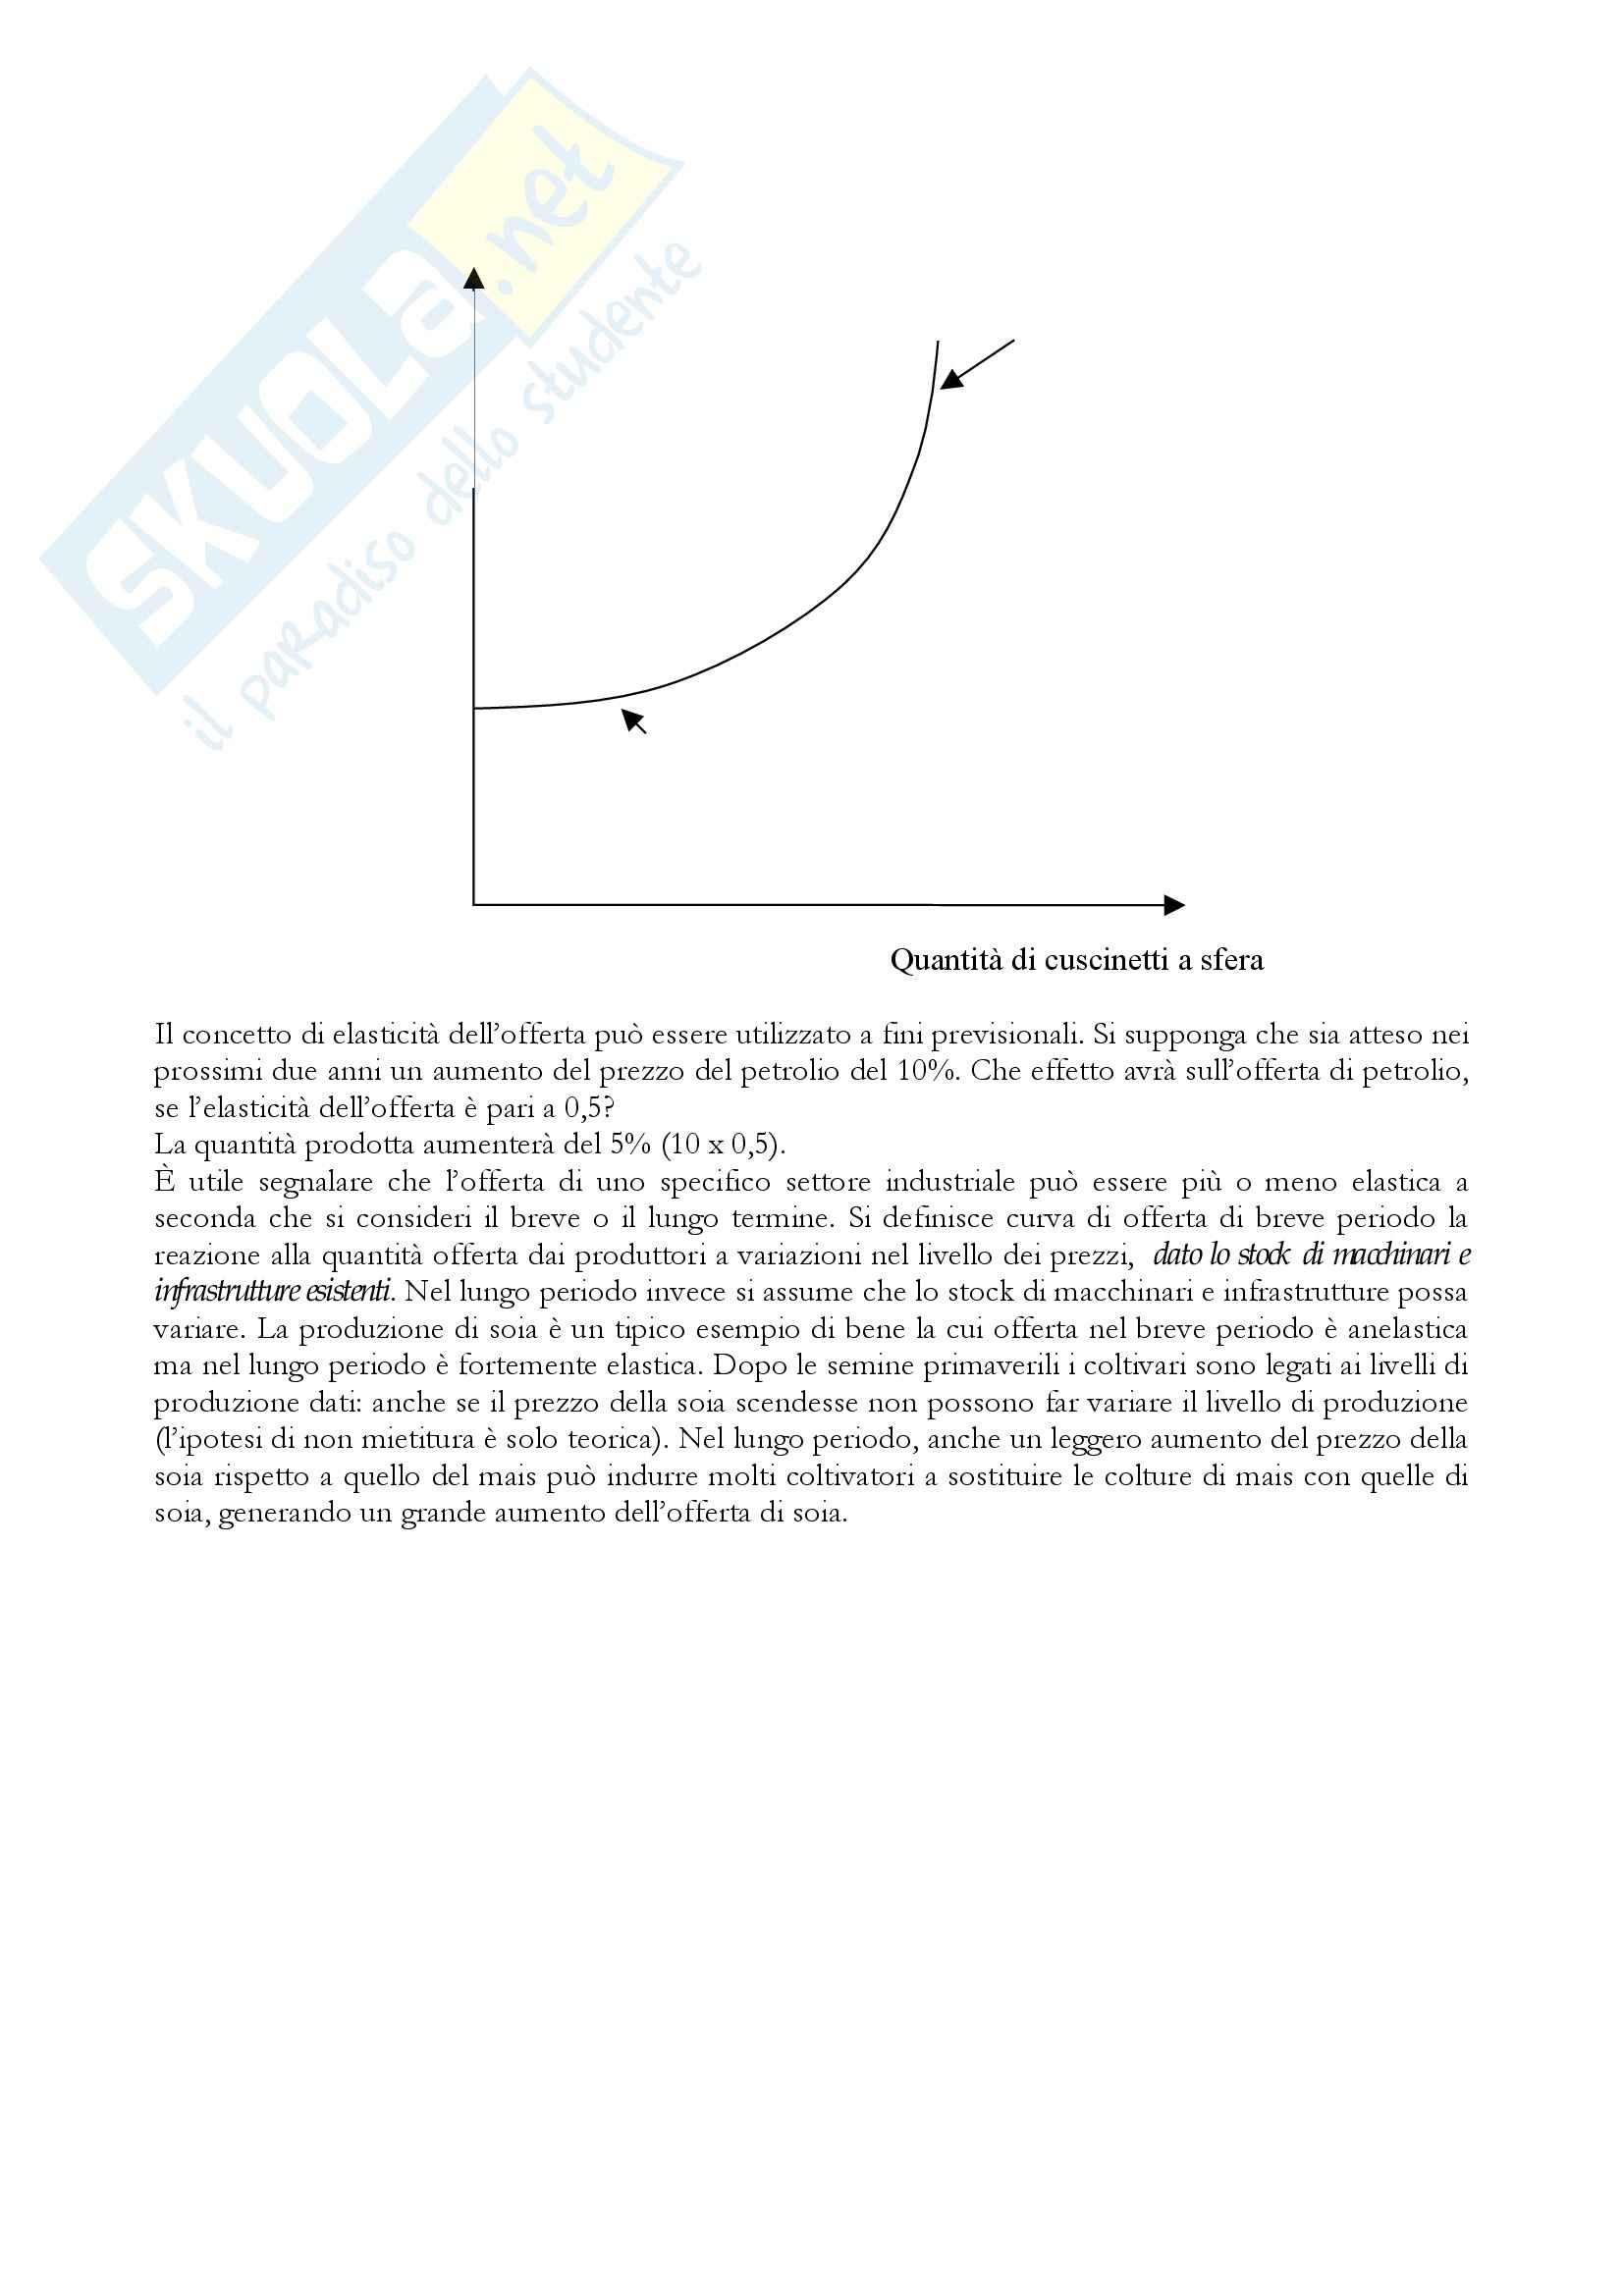 Teoria economica d'impresa - Introduzione Pag. 11